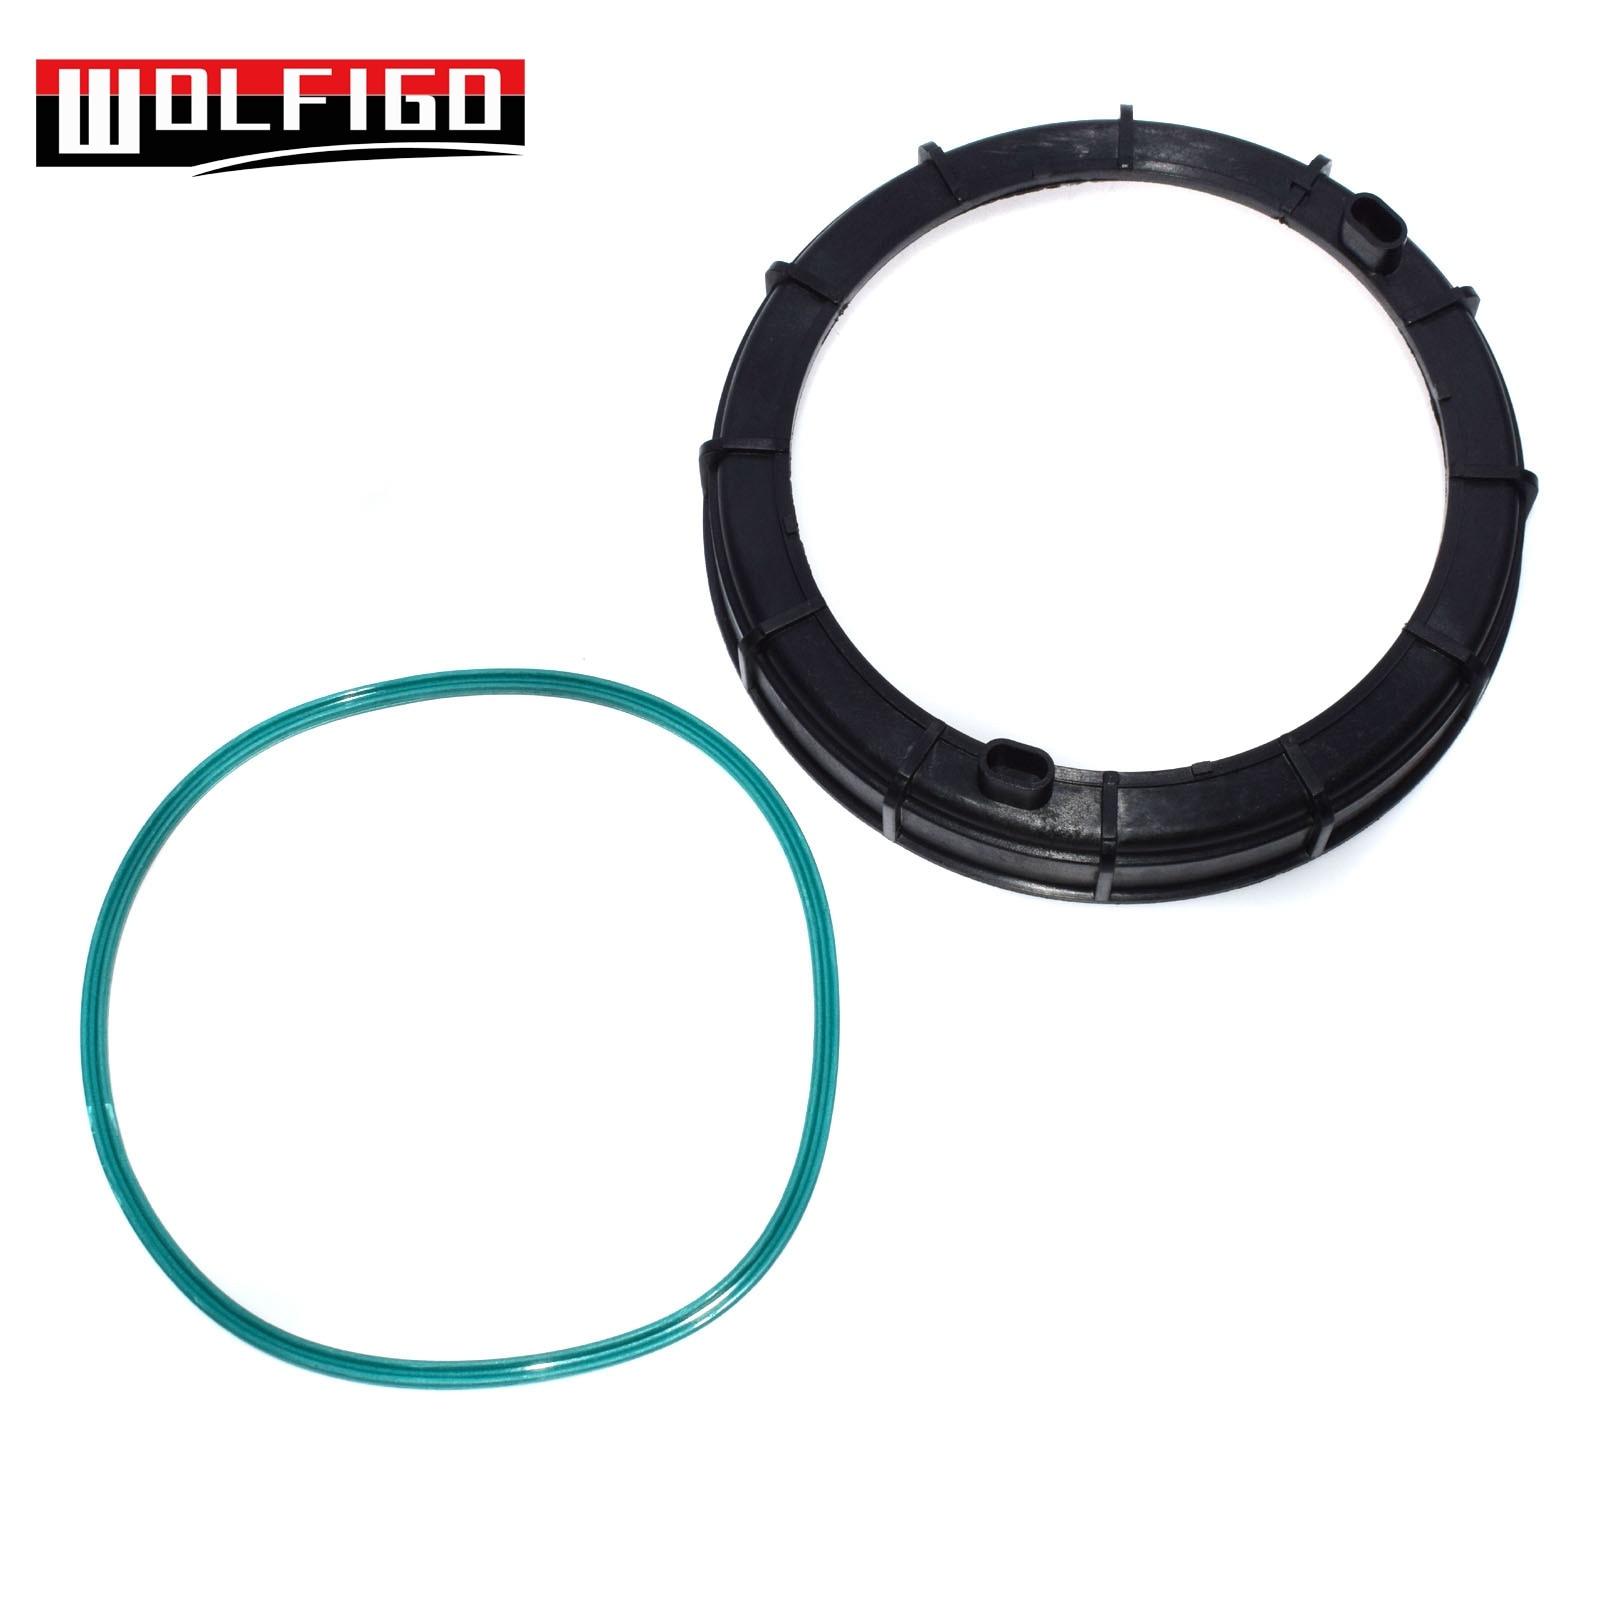 FOR Peugeot 106 206 306 307 Partner Fuel Tank Sender Unit Ring clamp pump